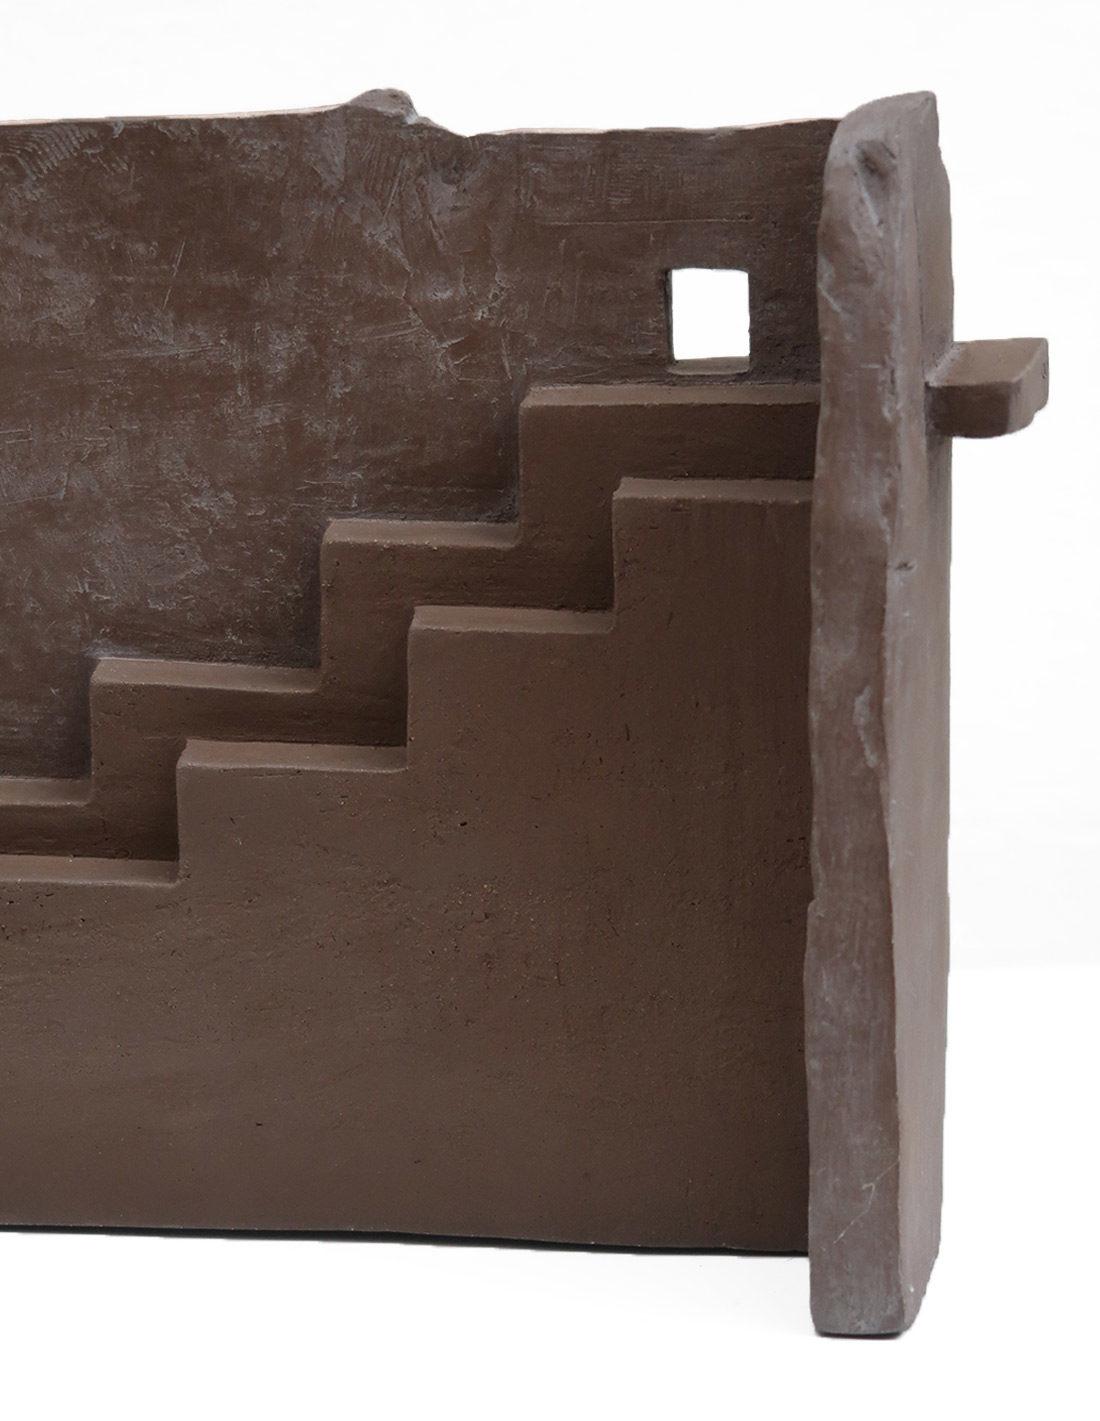 Agnès Nivot - Sculpture - Escaliers Hacienda